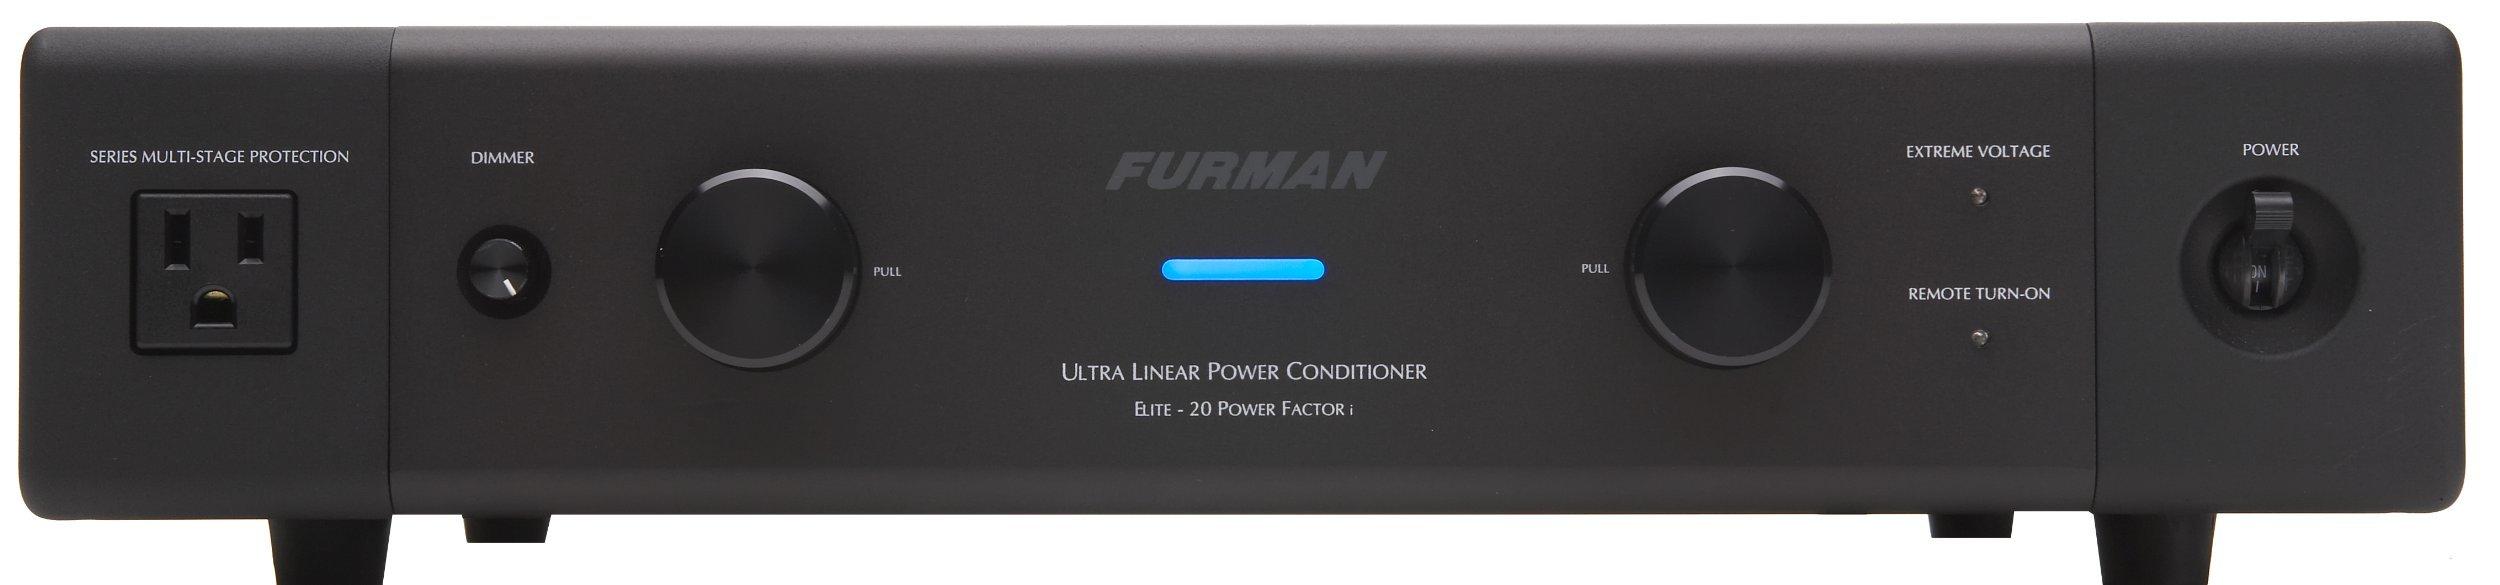 Furman Elite-20 PF i 13-Outlet Ultra Linear AC Power Source (Renewed)